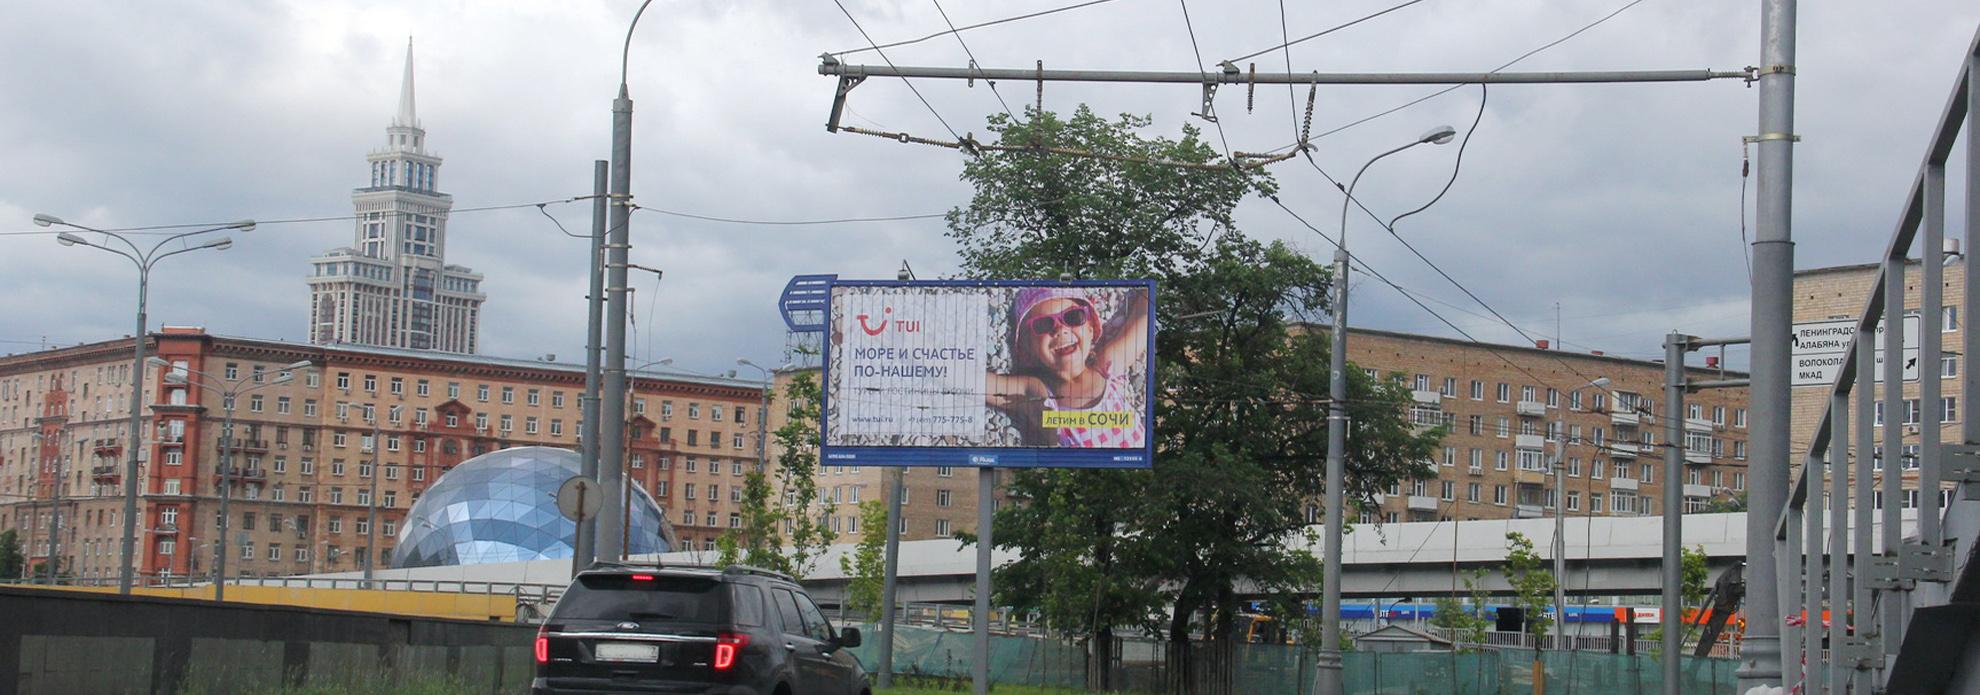 tui-naruzhnaya-reklama-3h6-format-foto-moscow-leningradskiy-2016